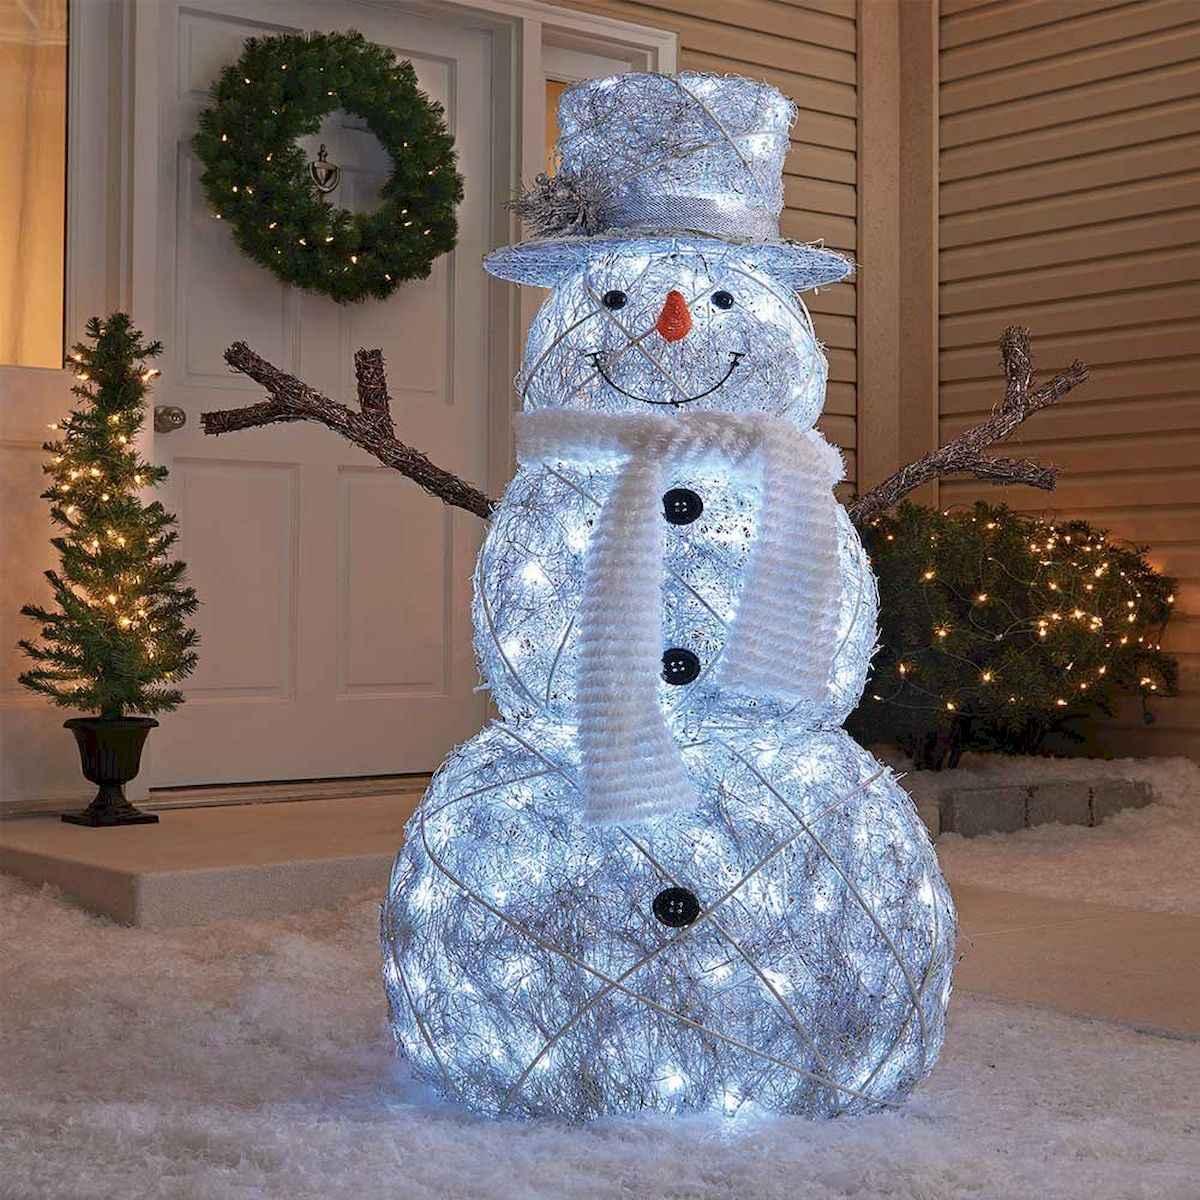 40 amazing outdoor christmas decorations ideas (11)